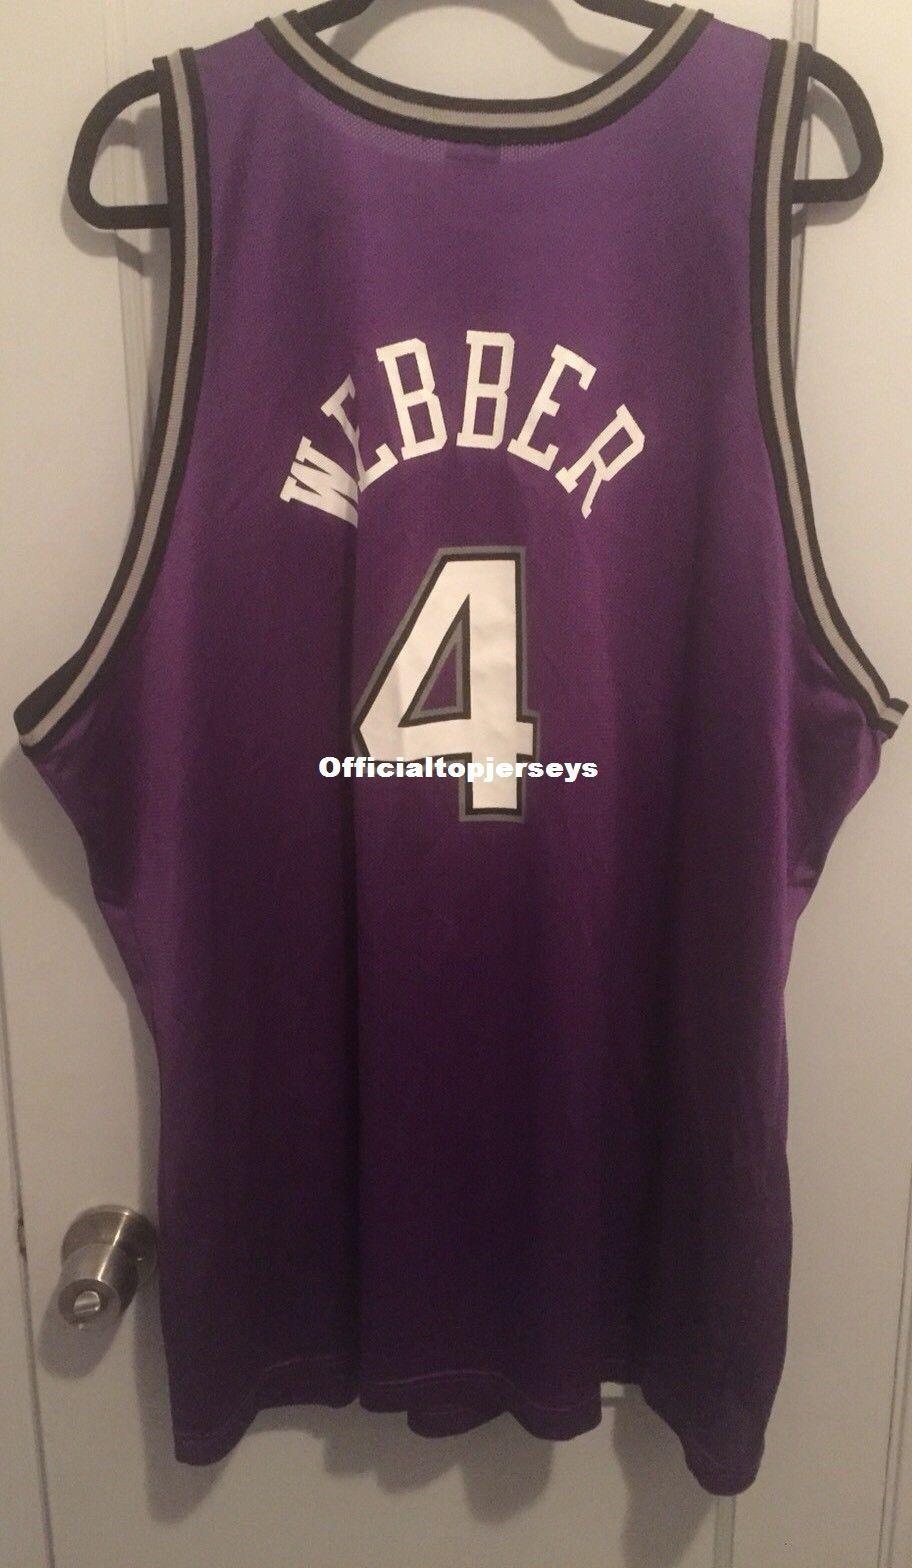 buy online d5180 cc9f1 Cheap wholesale Chris Webber 4# Jersey Champion 90s Mint Bibby T-shirt vest  Stitched Basketball jerseys Ncaa